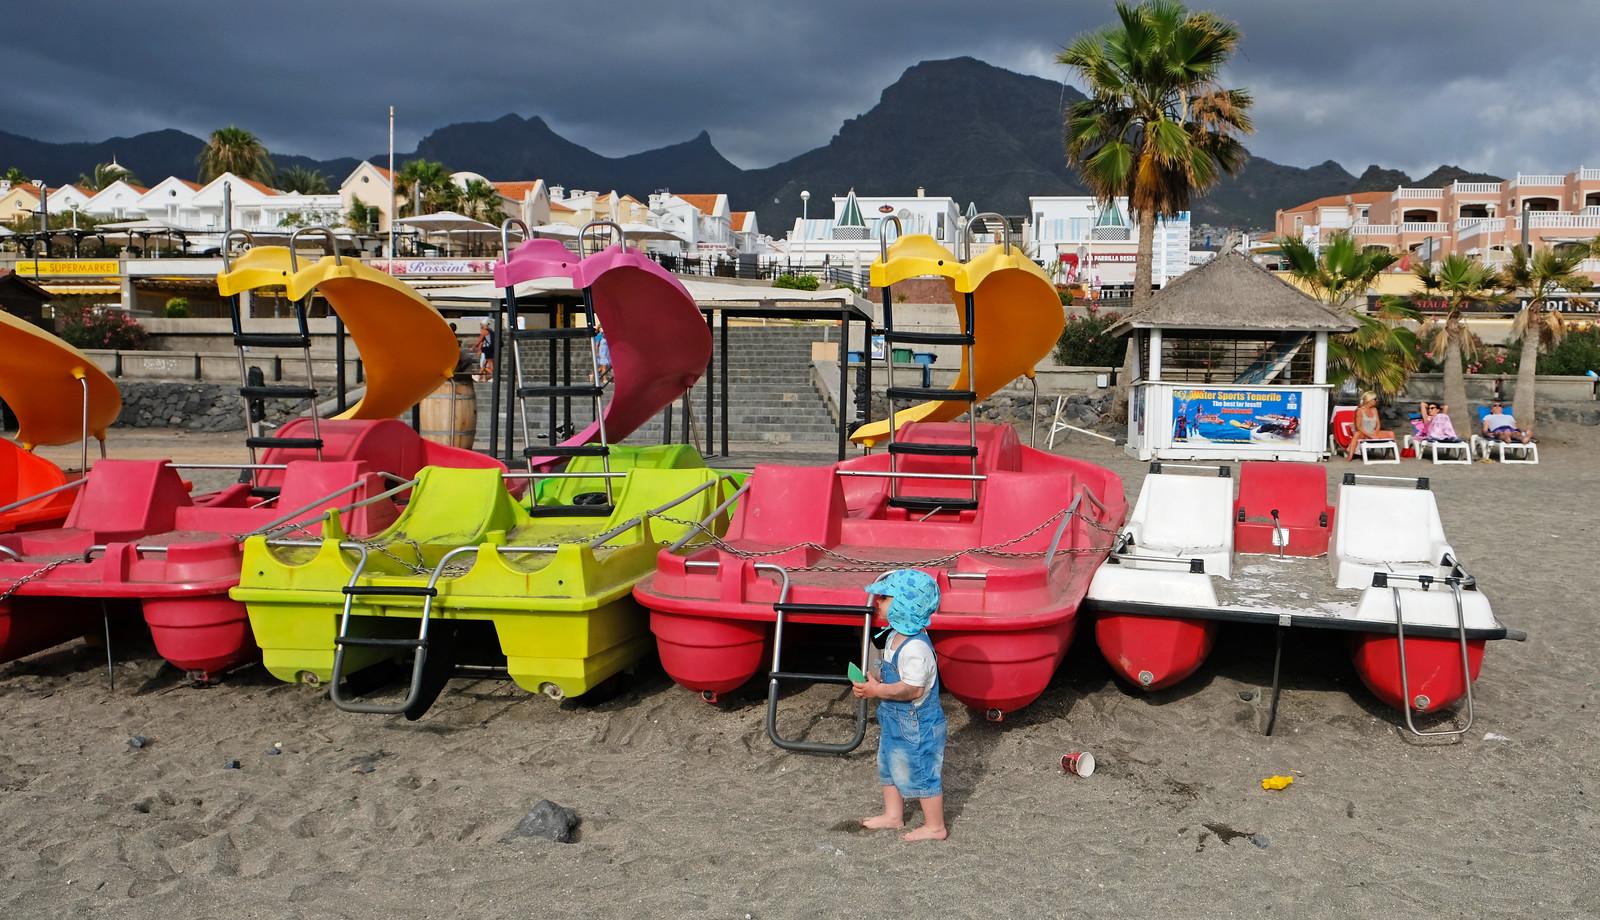 Fanabe Beach, Tenerife, Canary Islands, Spain